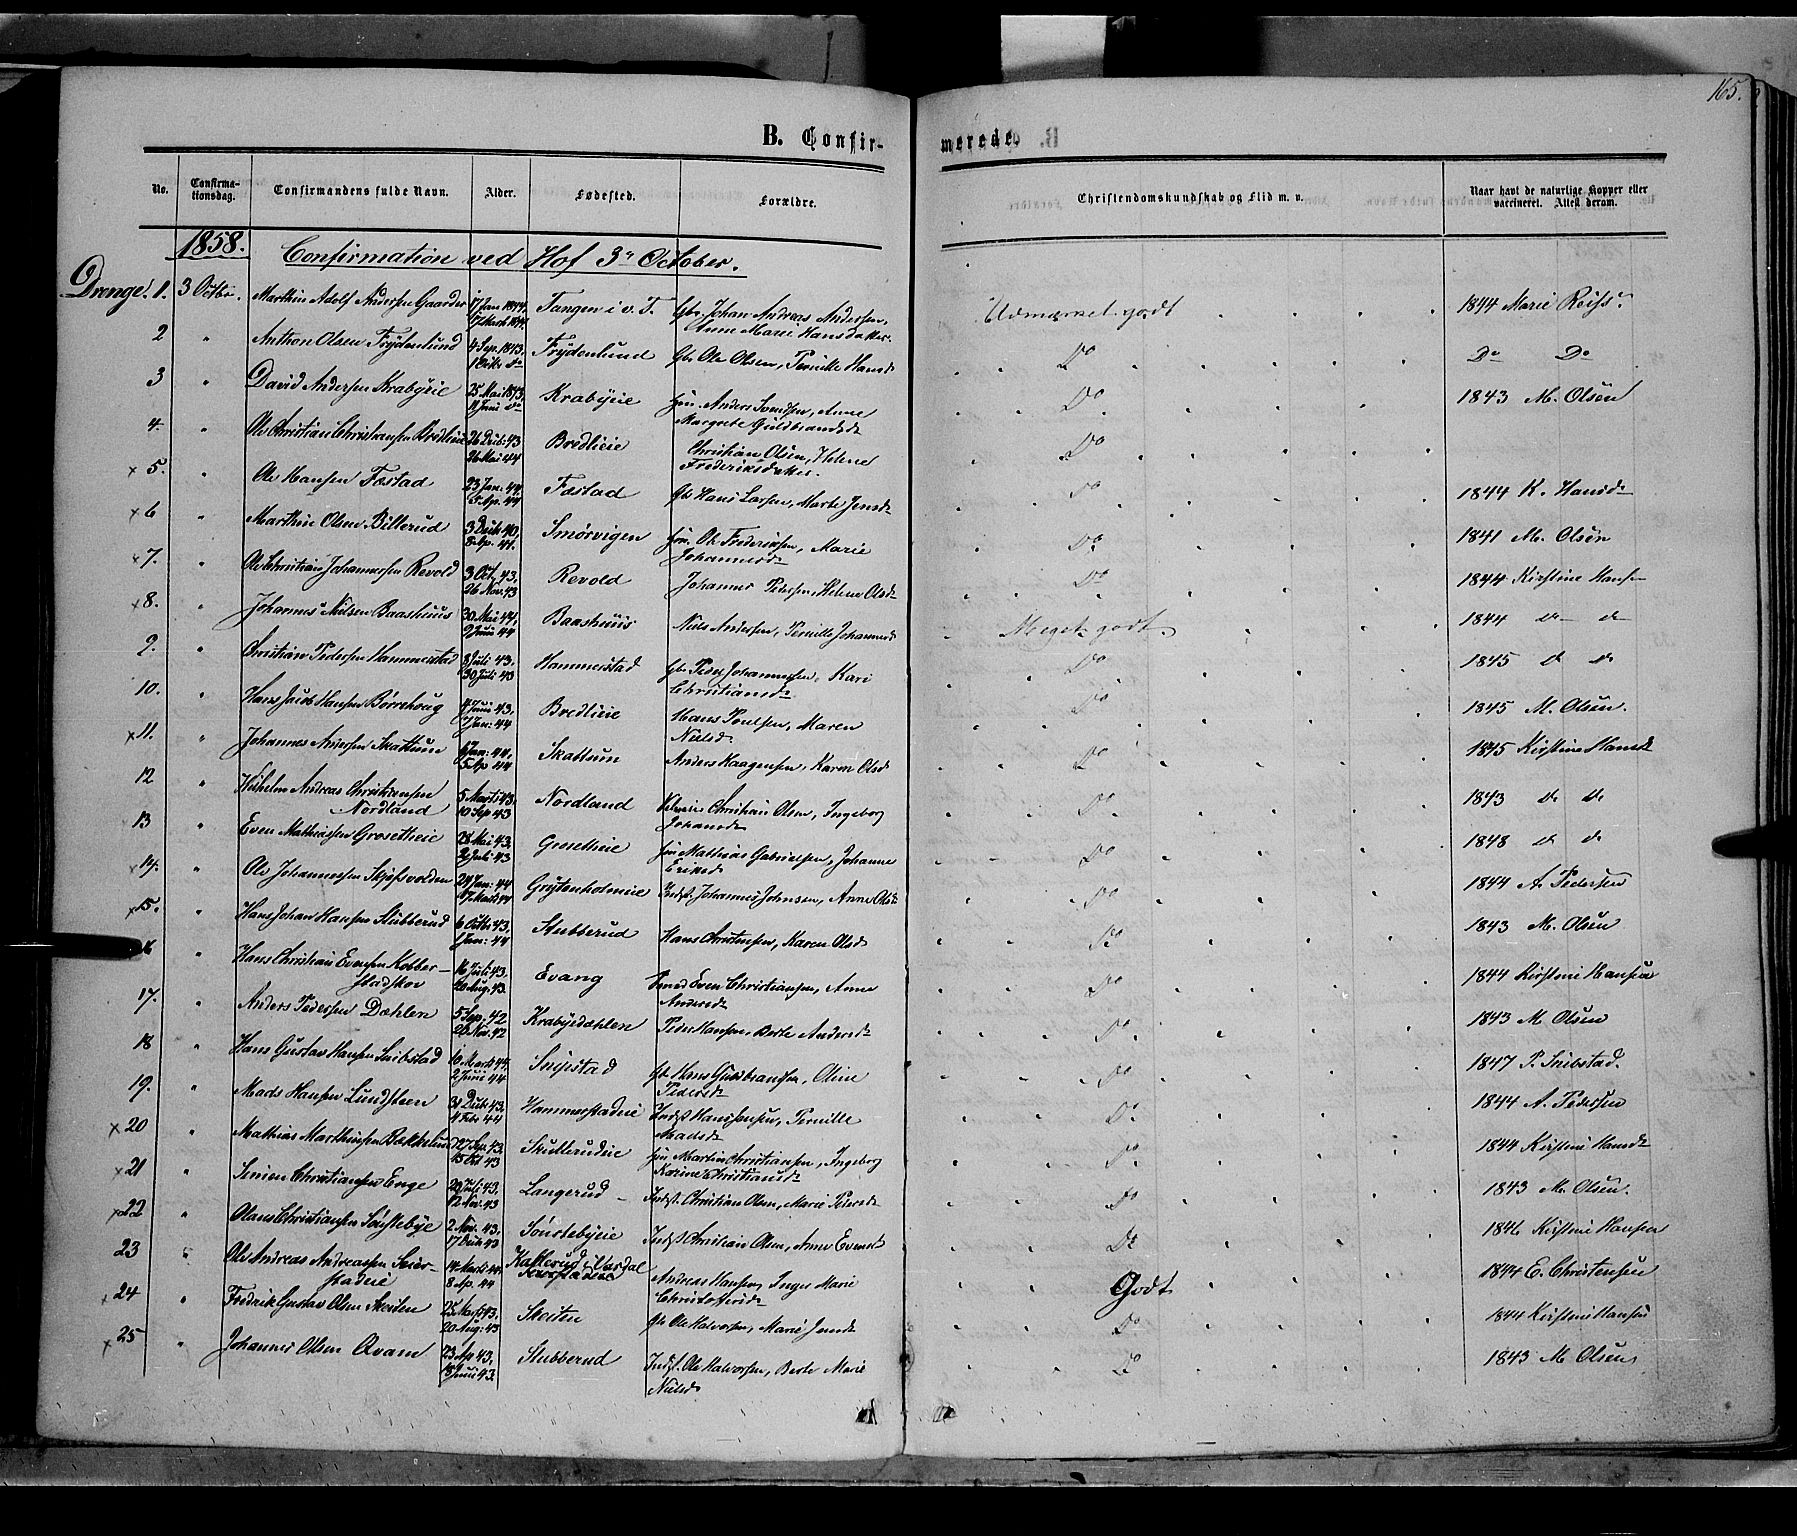 SAH, Østre Toten prestekontor, Ministerialbok nr. 4, 1857-1865, s. 165